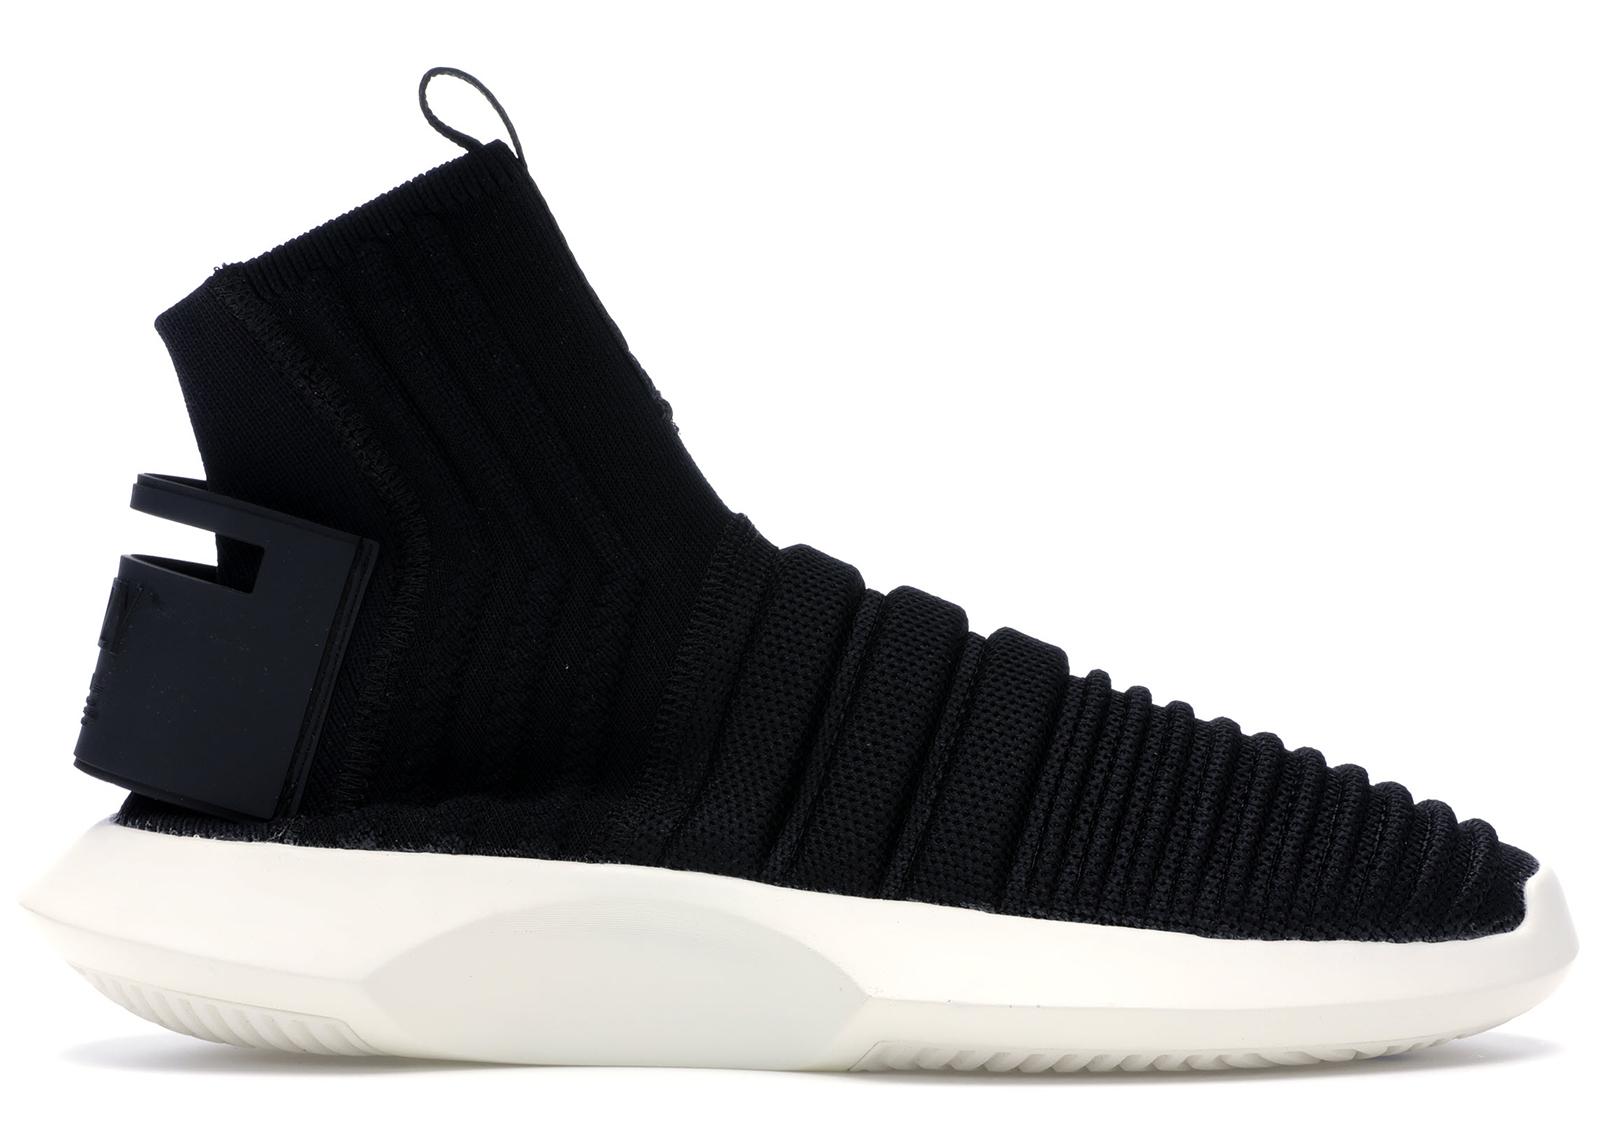 adidas crazy 1 adv core black